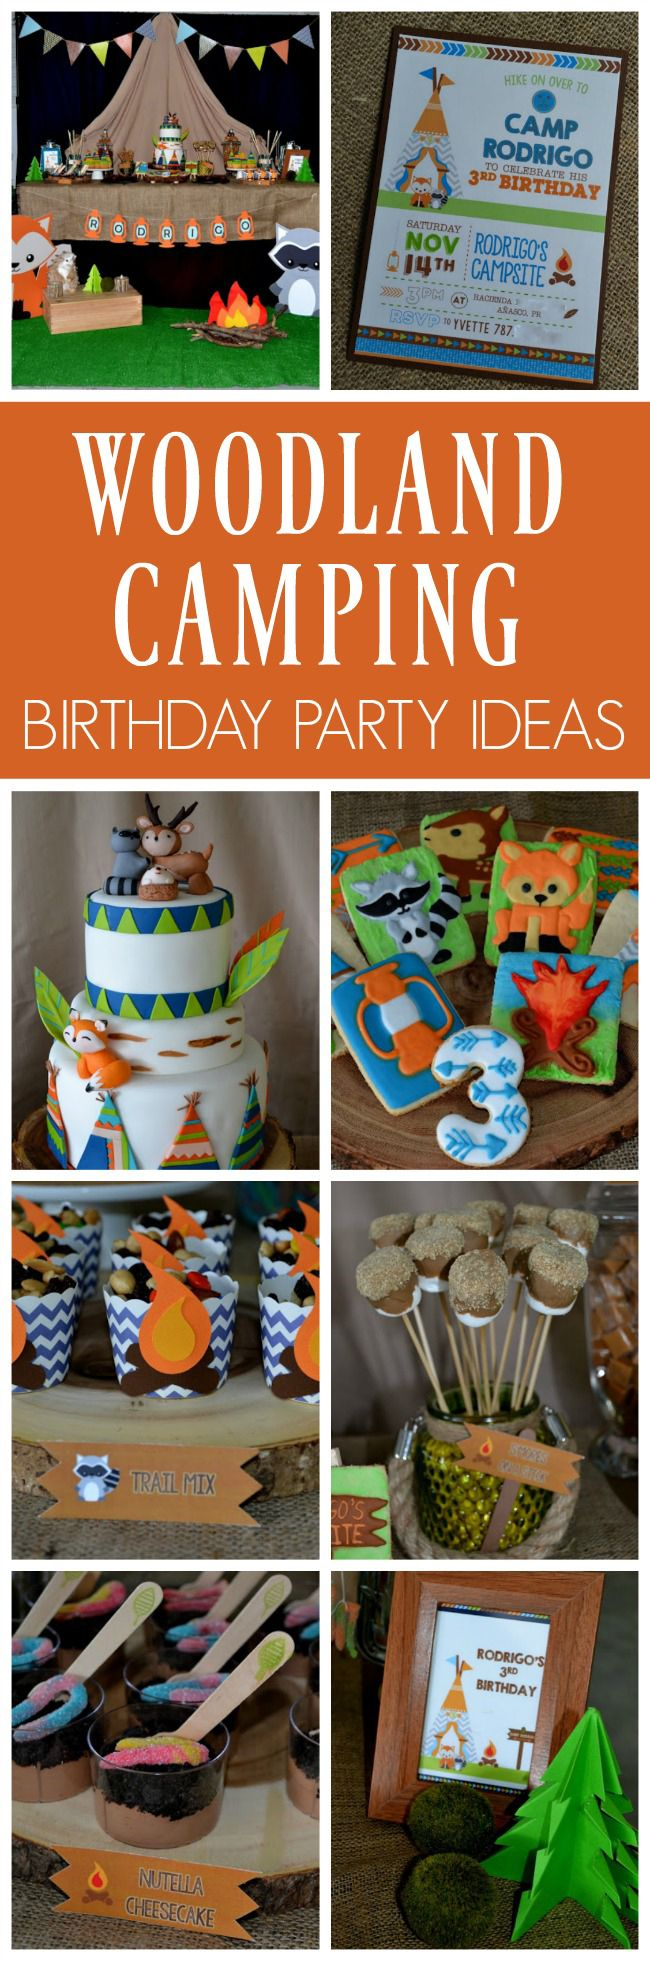 Woodland Camping Birthday Fun Birthdays Birthday party ideas and